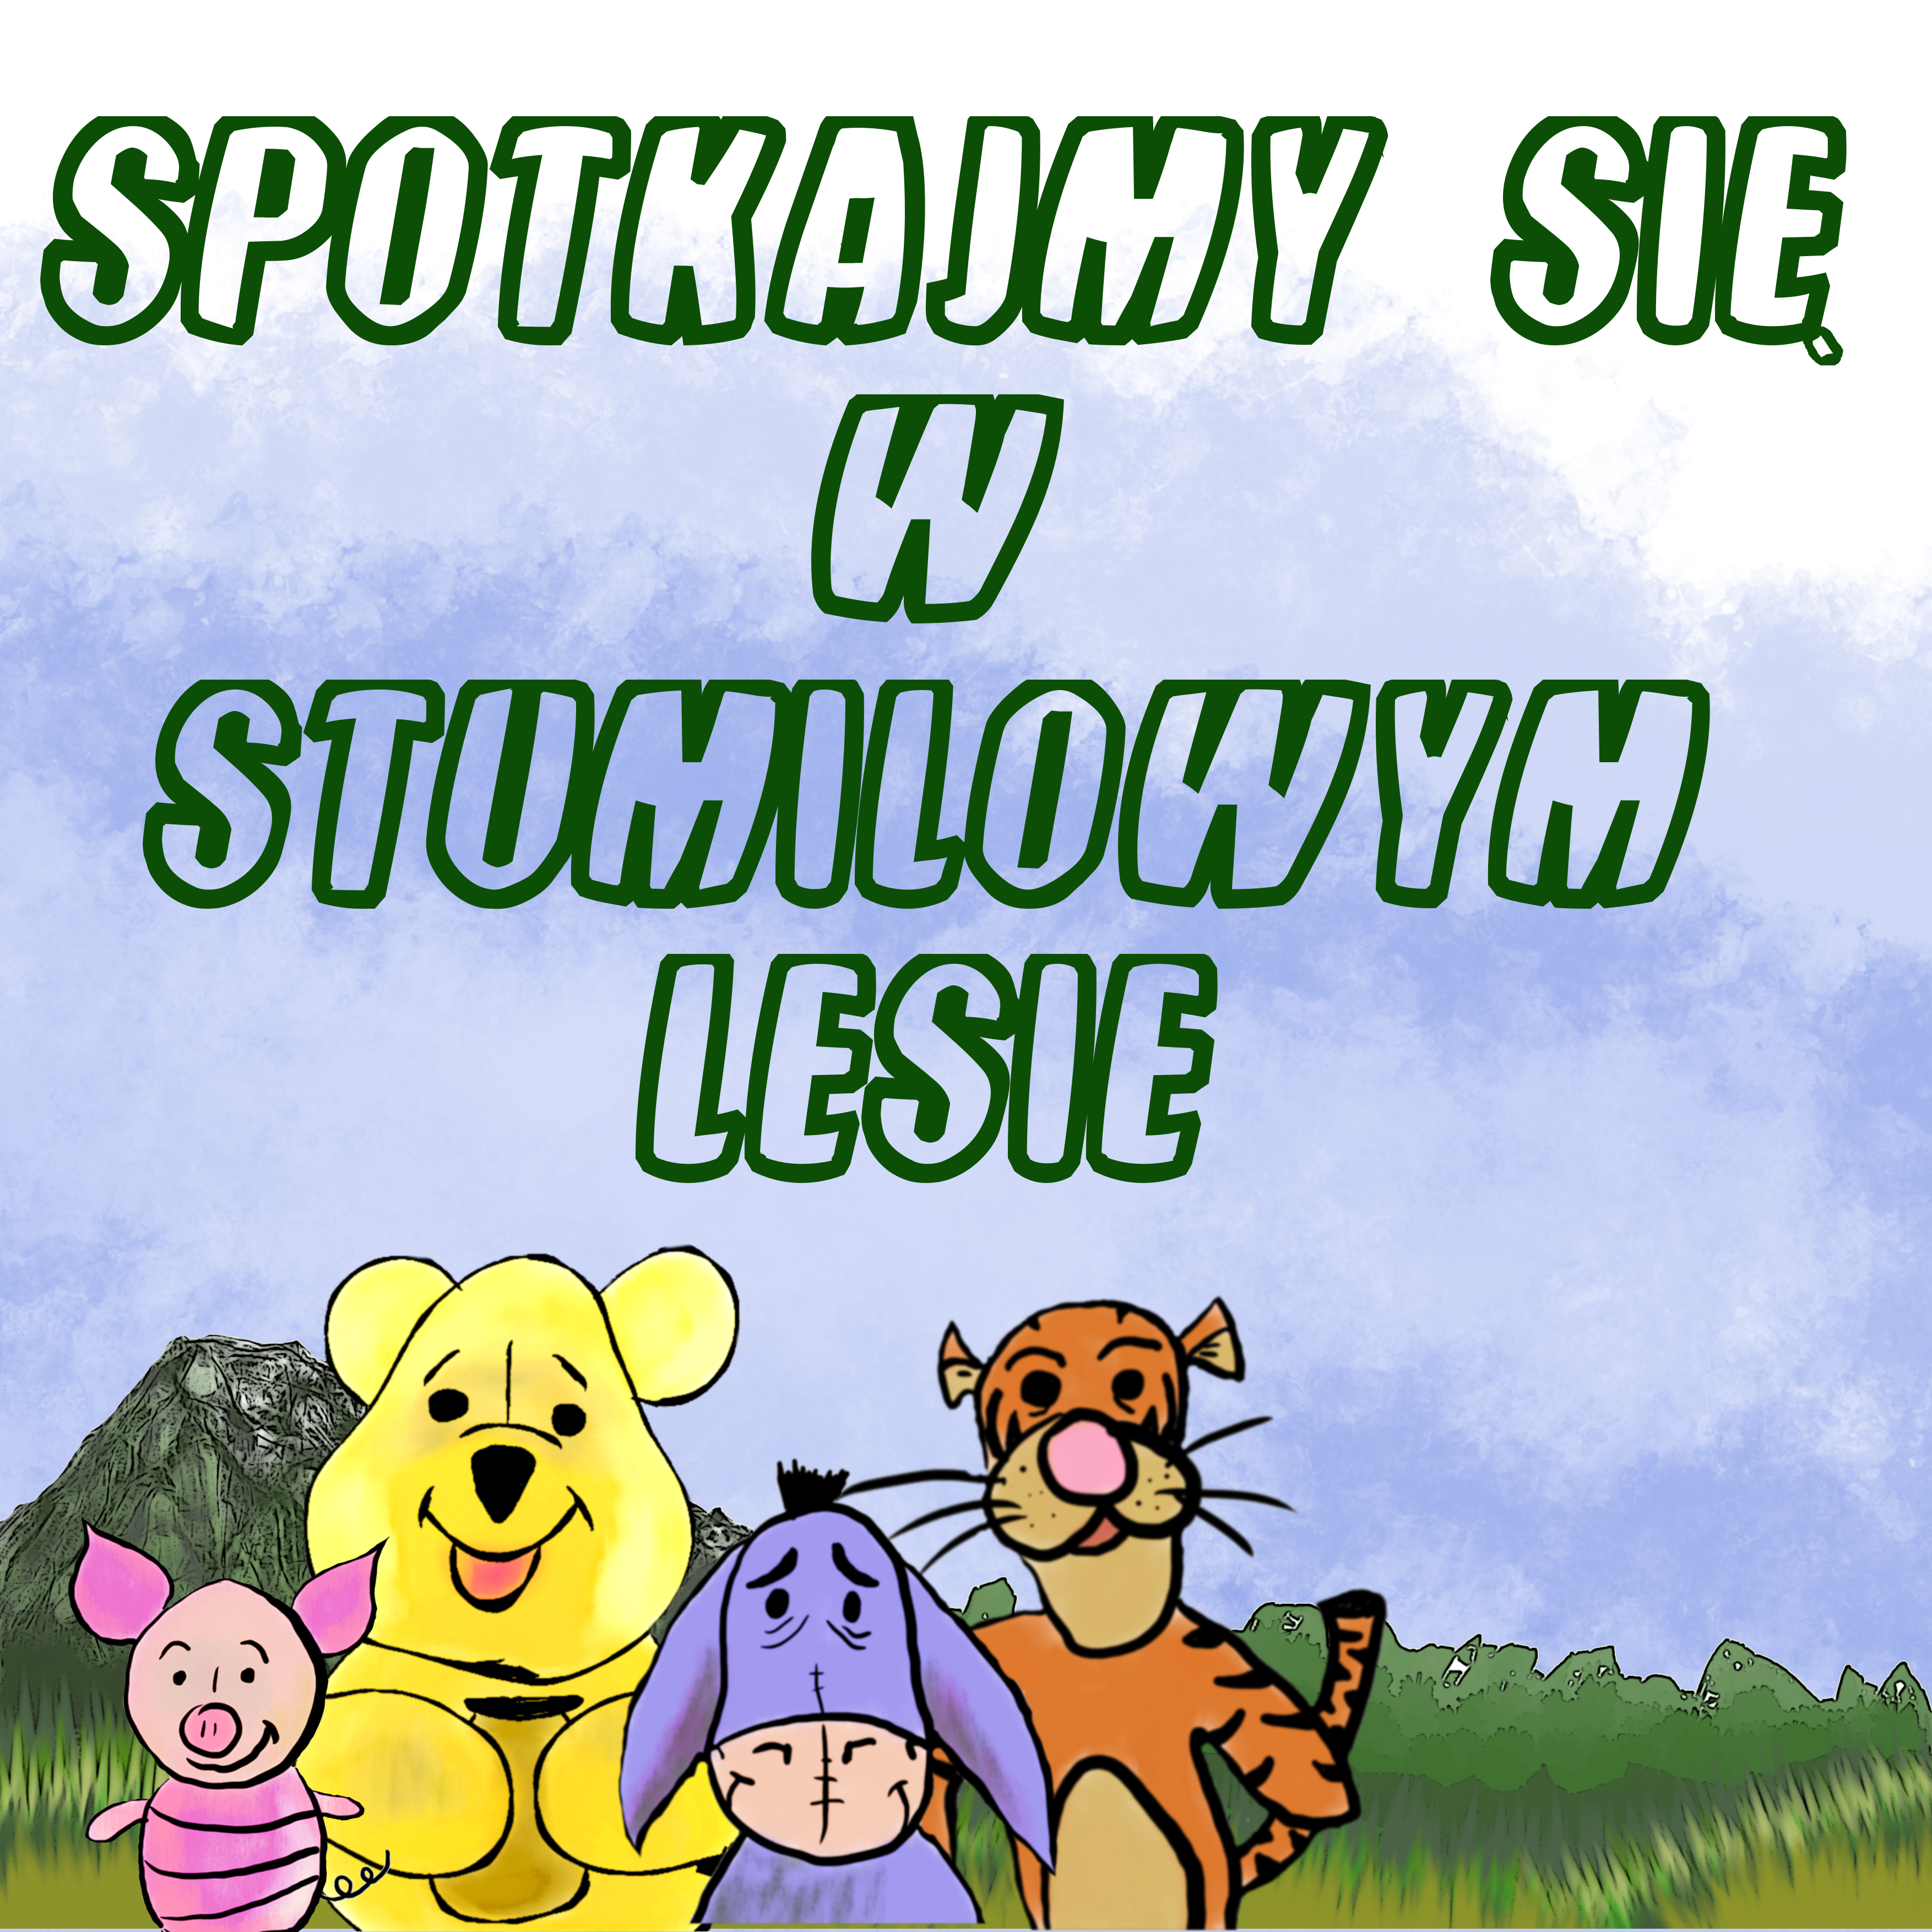 Stumilowy Las2